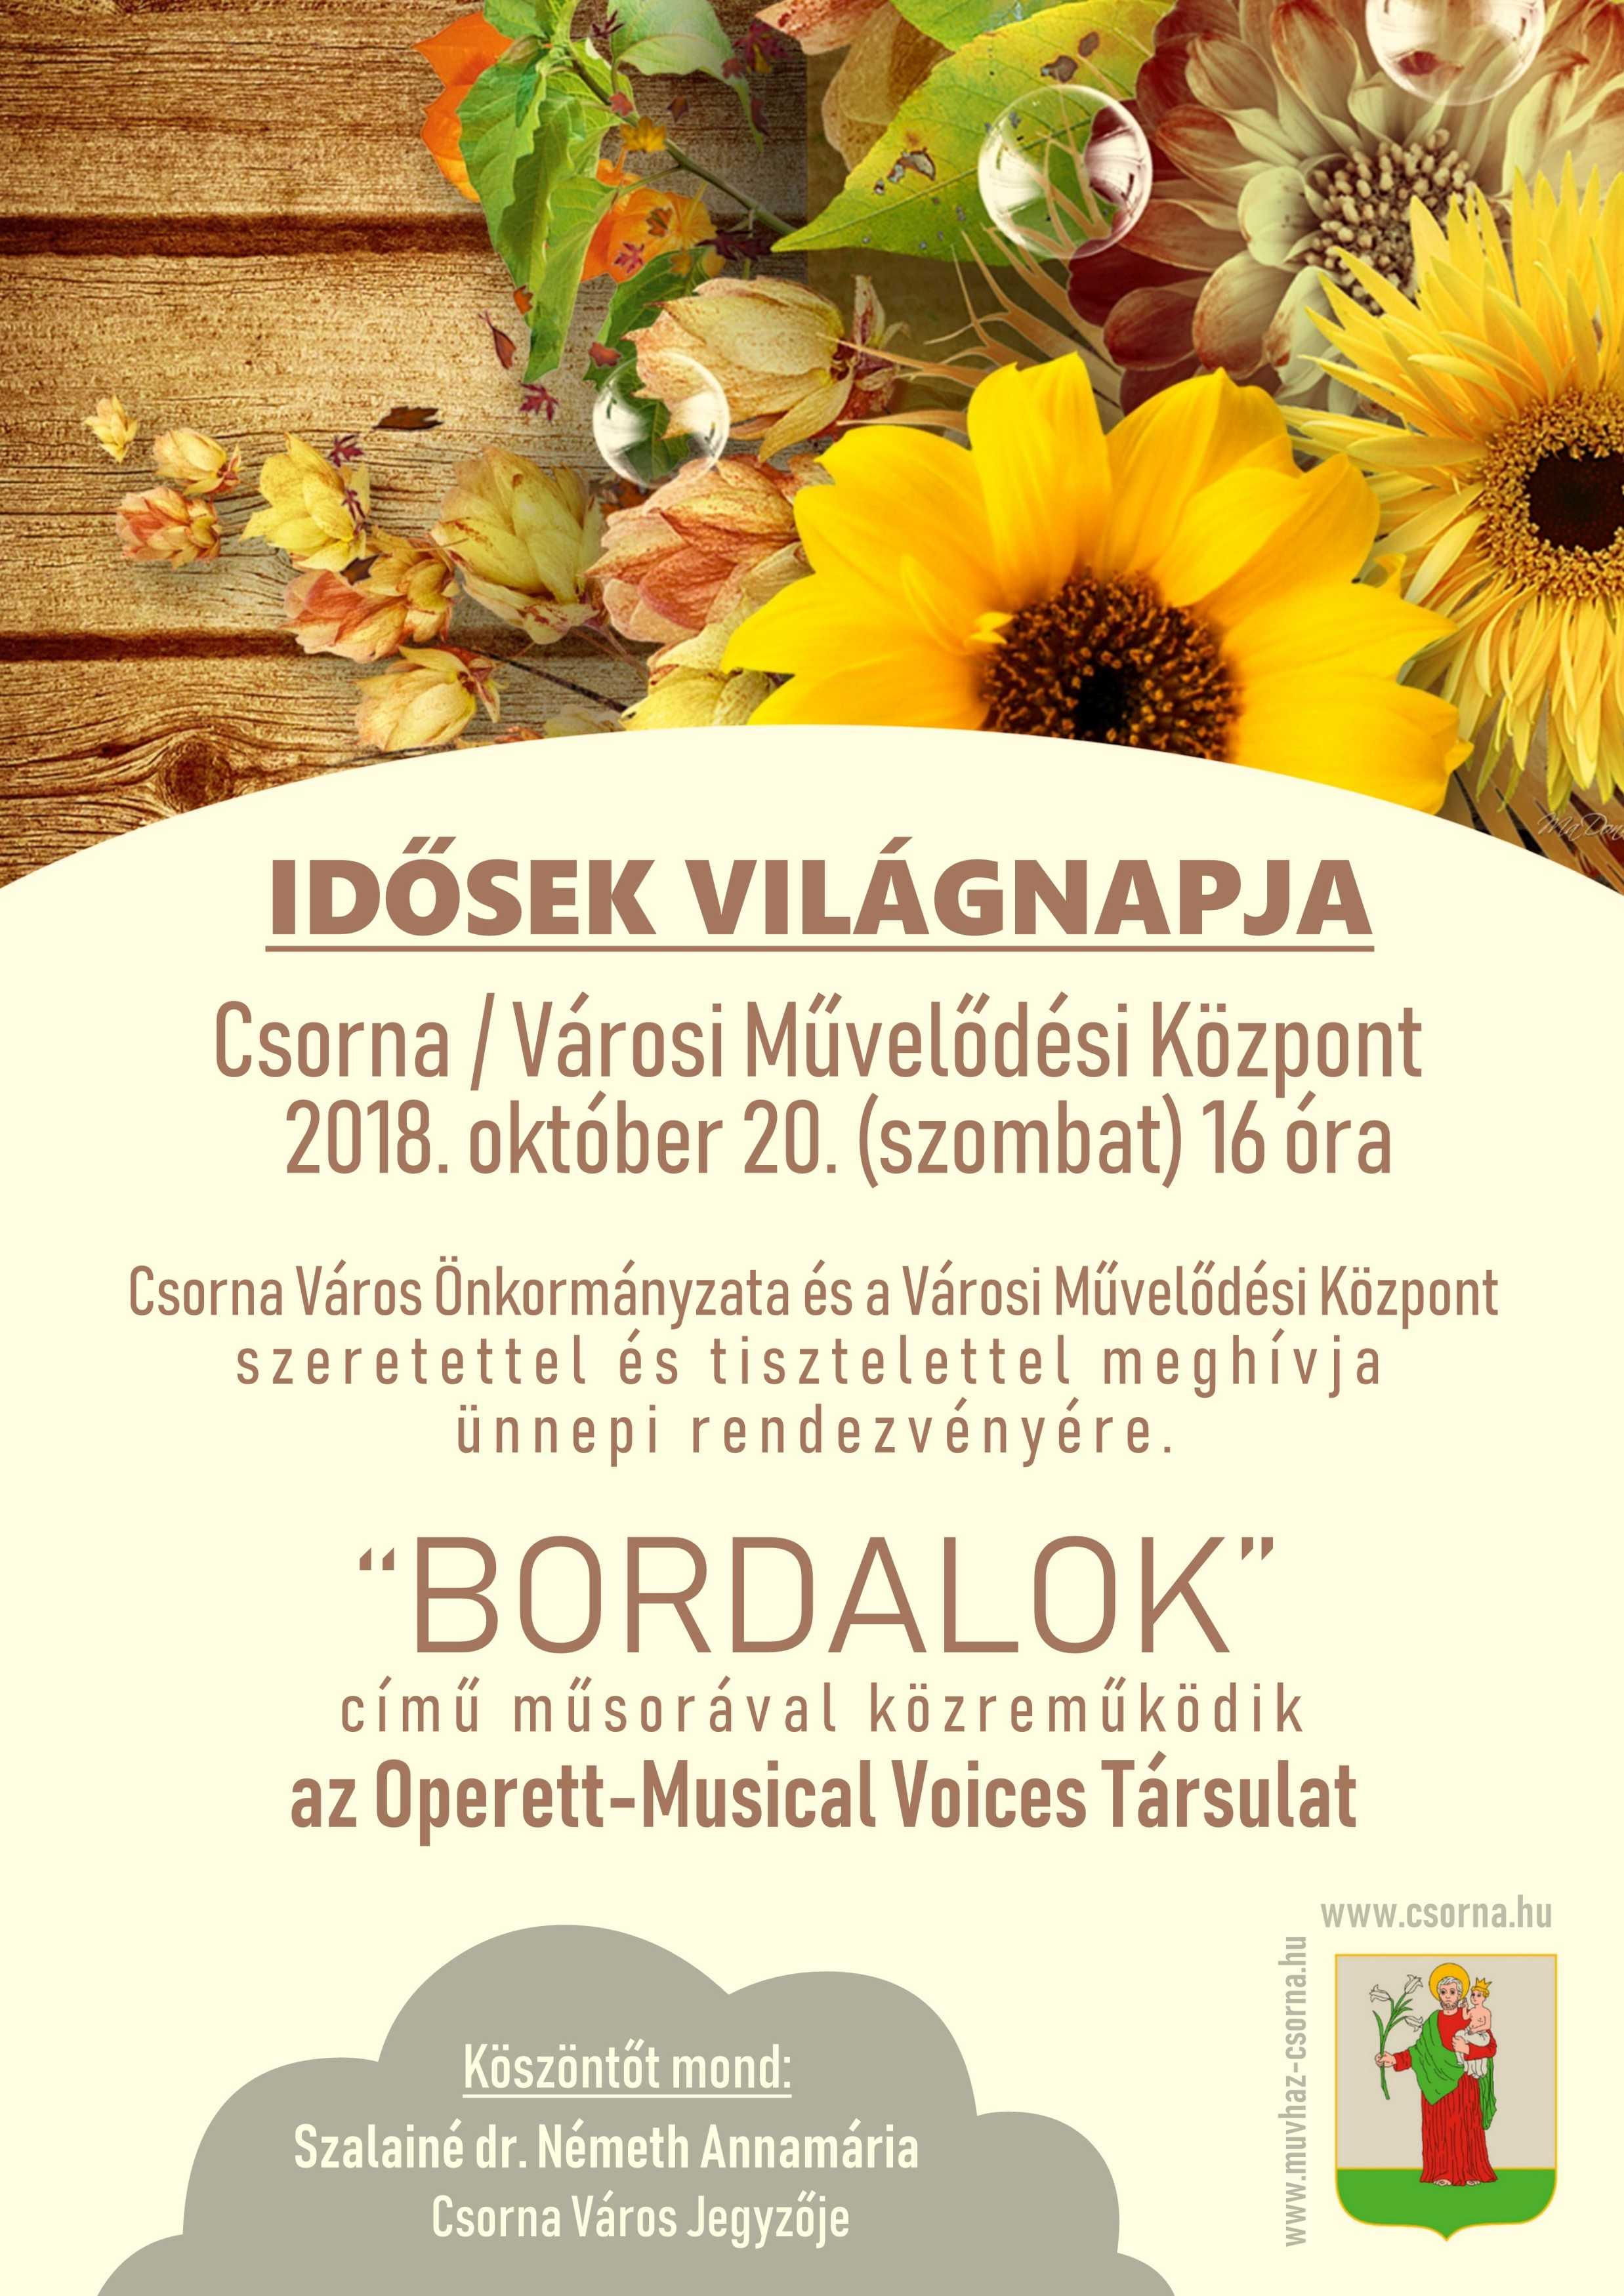 idosek_napja_2018_plakat